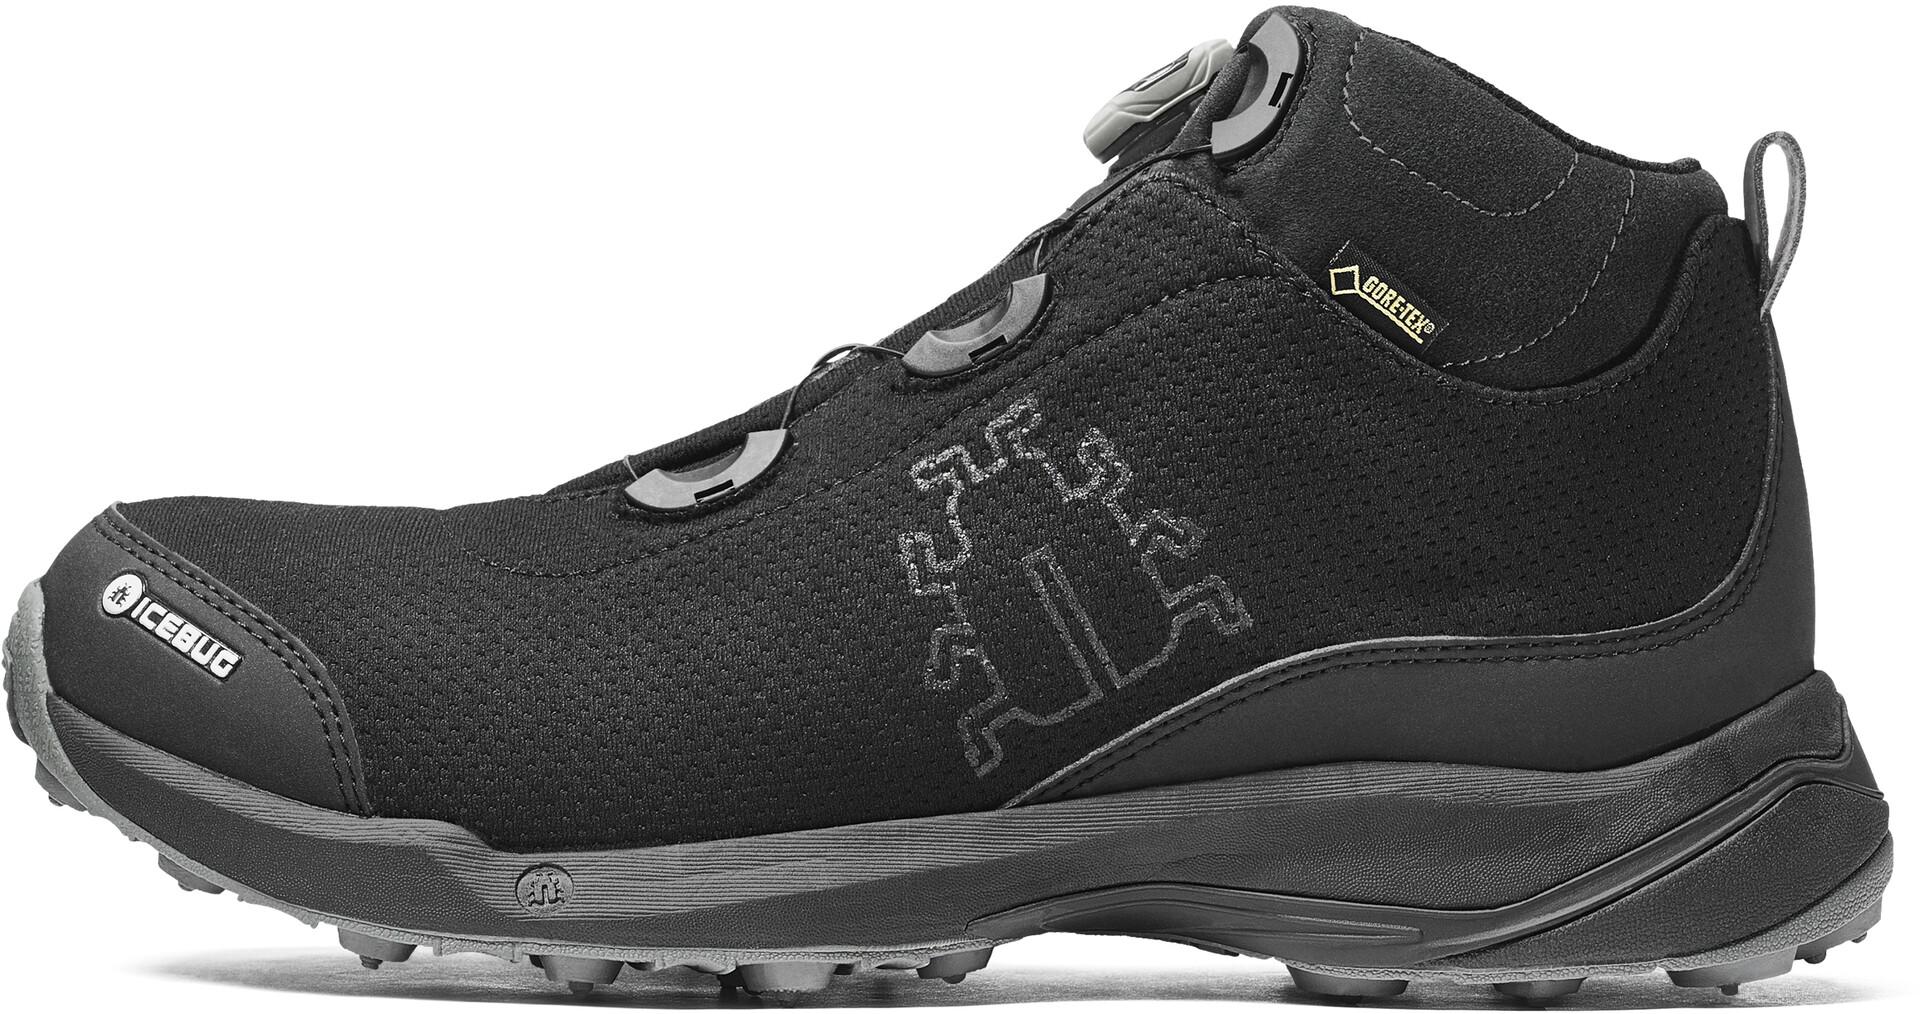 Chaussures Gtx Homme Noir Detour Bugrip Icebug Running jSzpqMVLUG